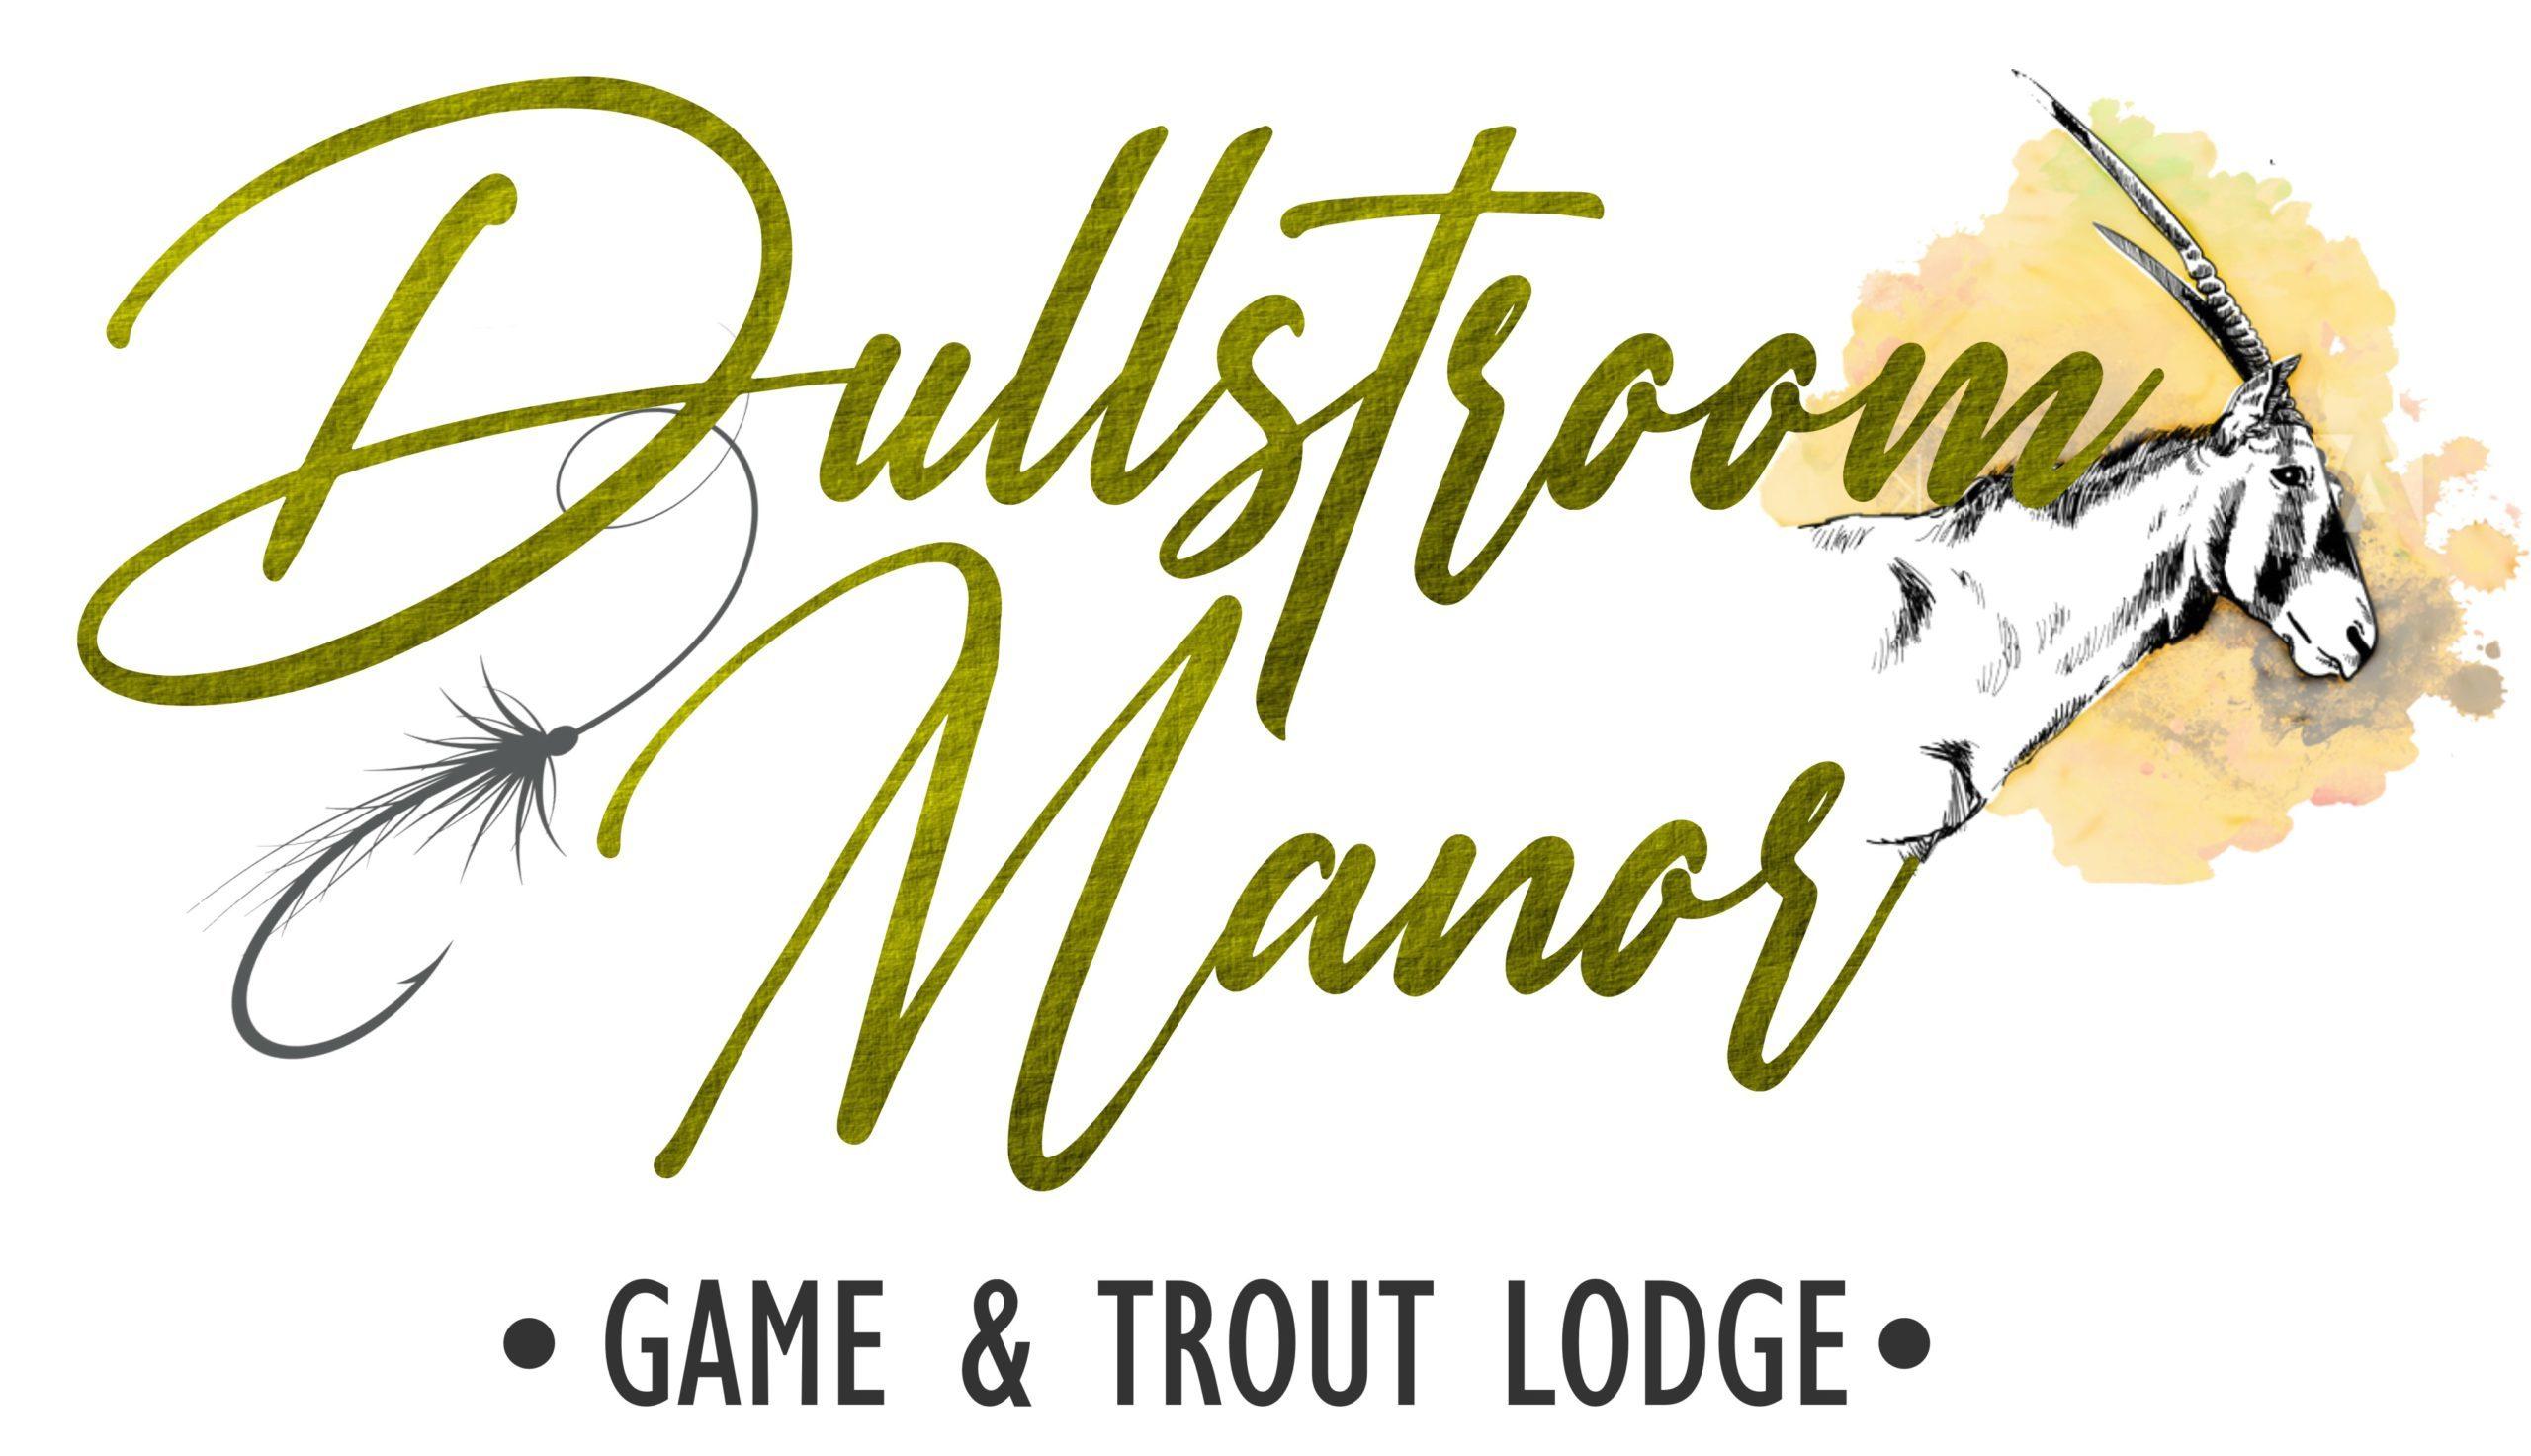 Dullstroom Manor